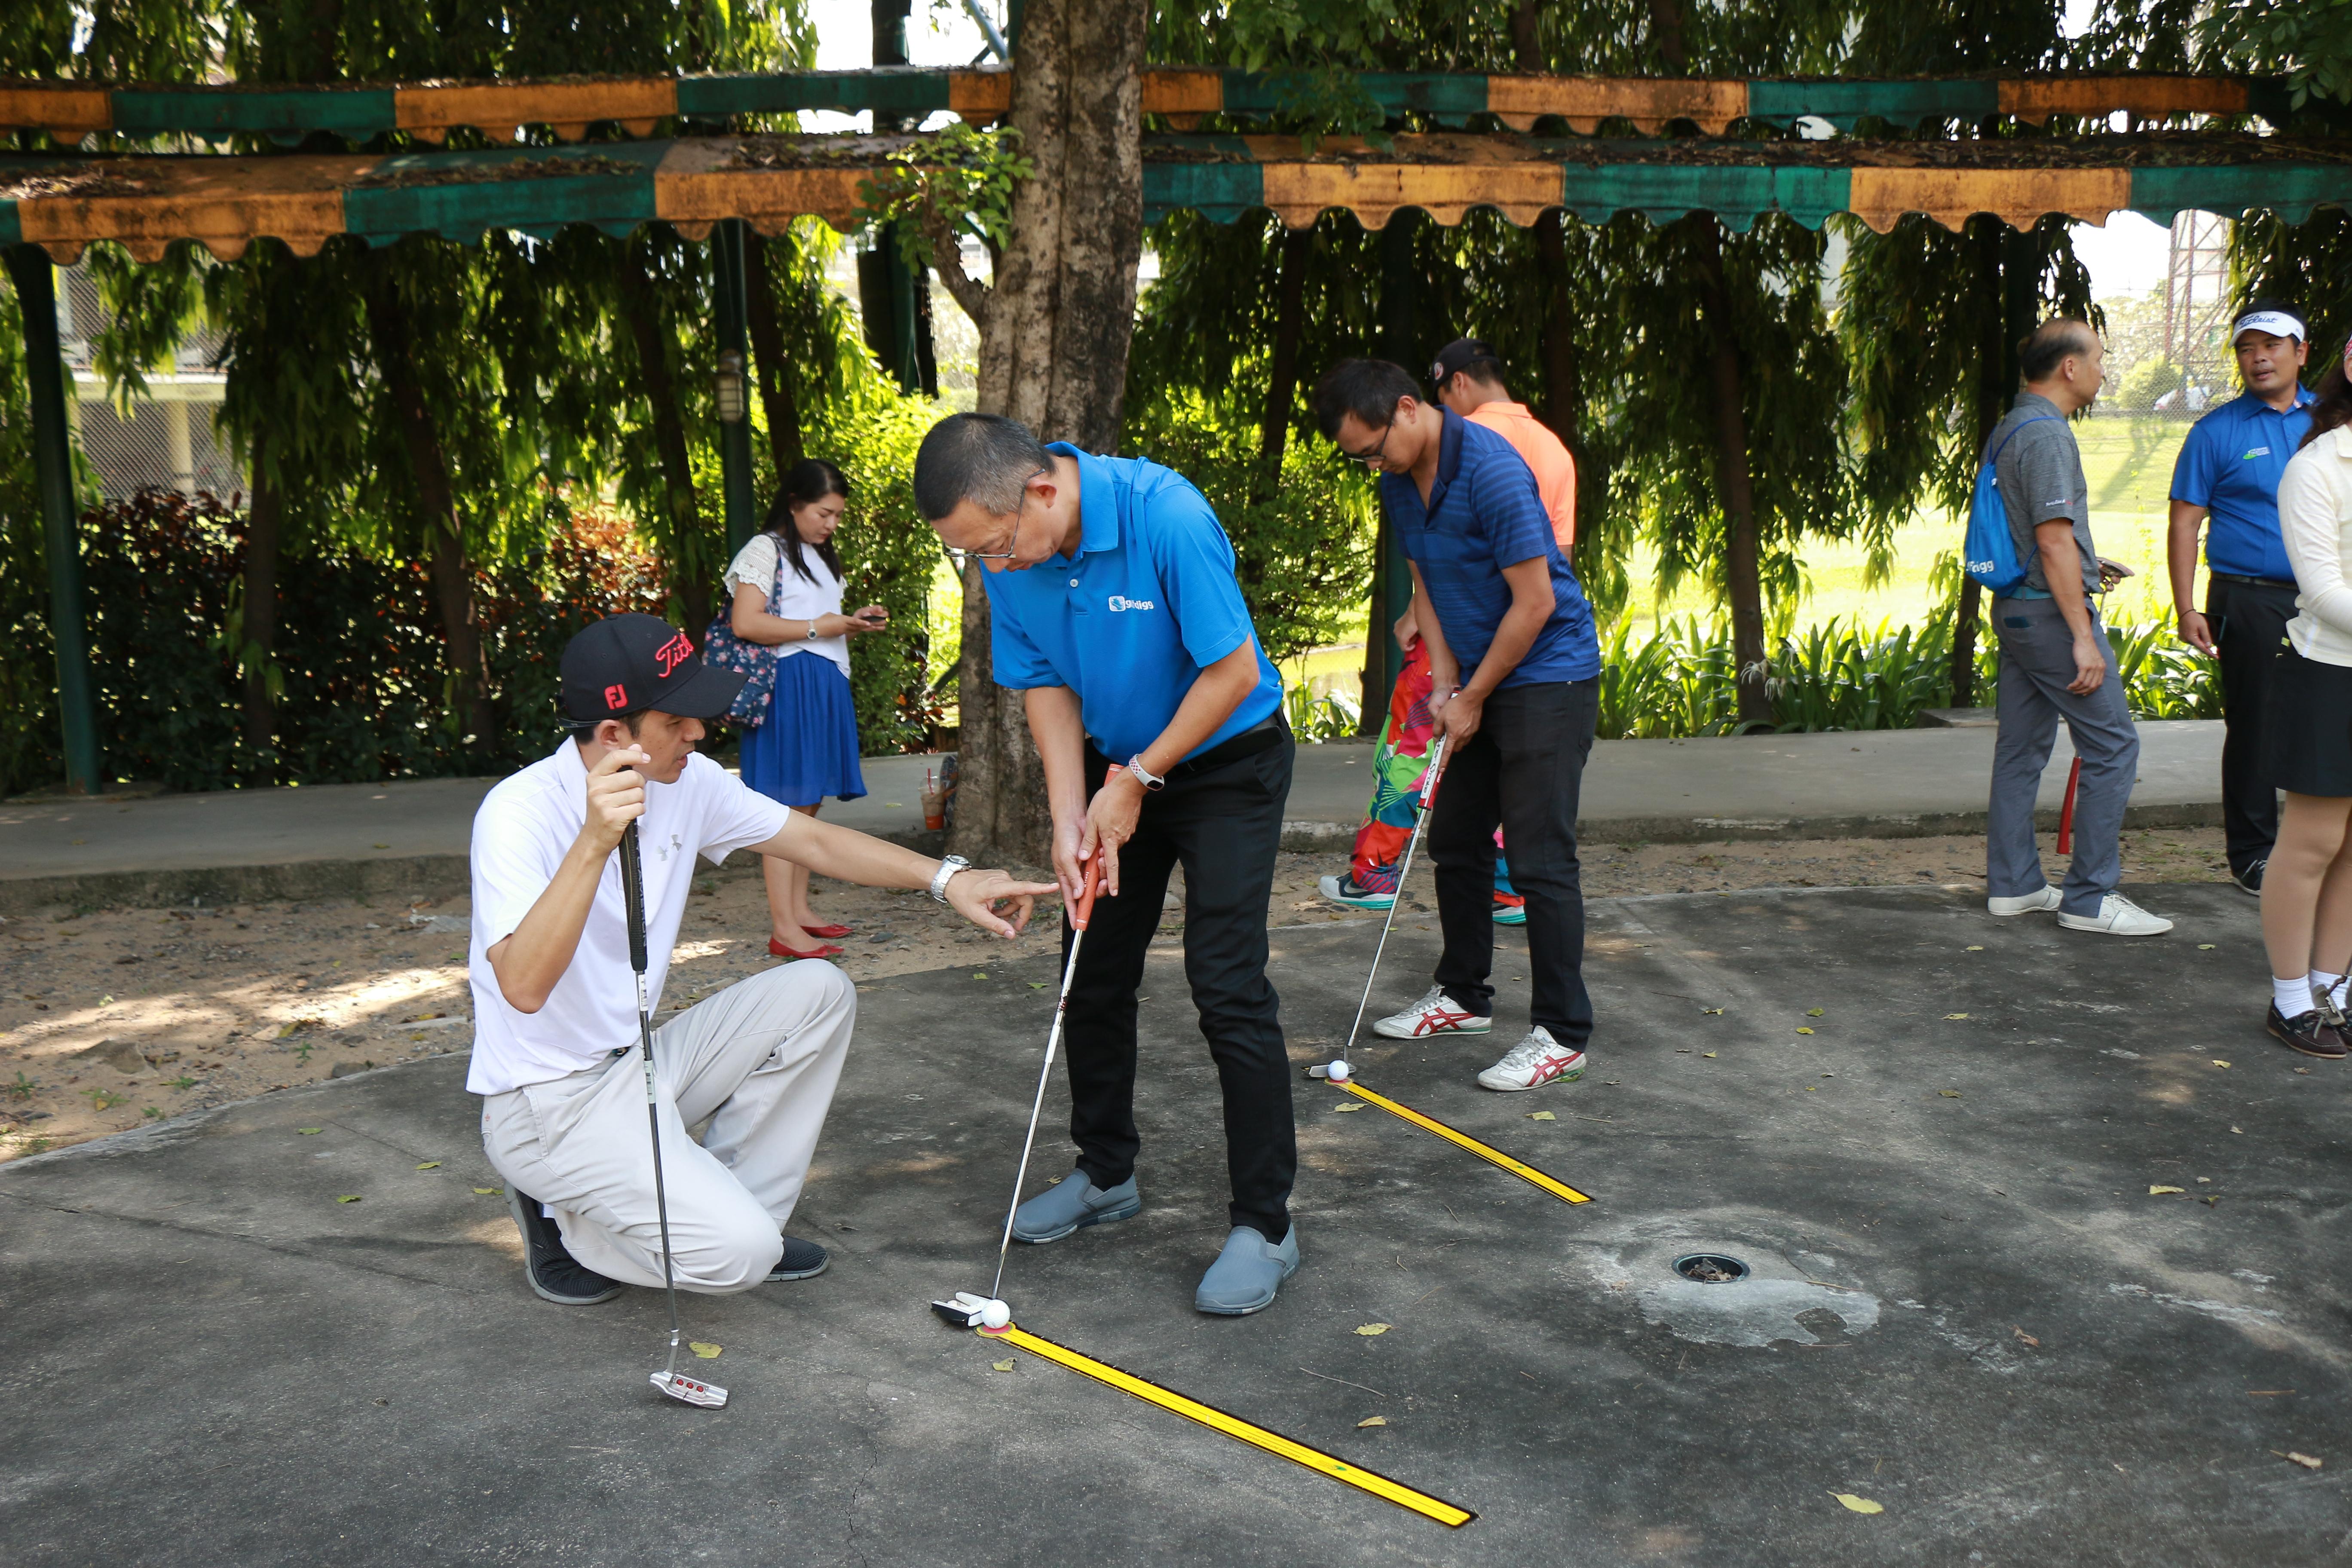 golfdigg_golfdiggtoday_golf_lesson_Pro